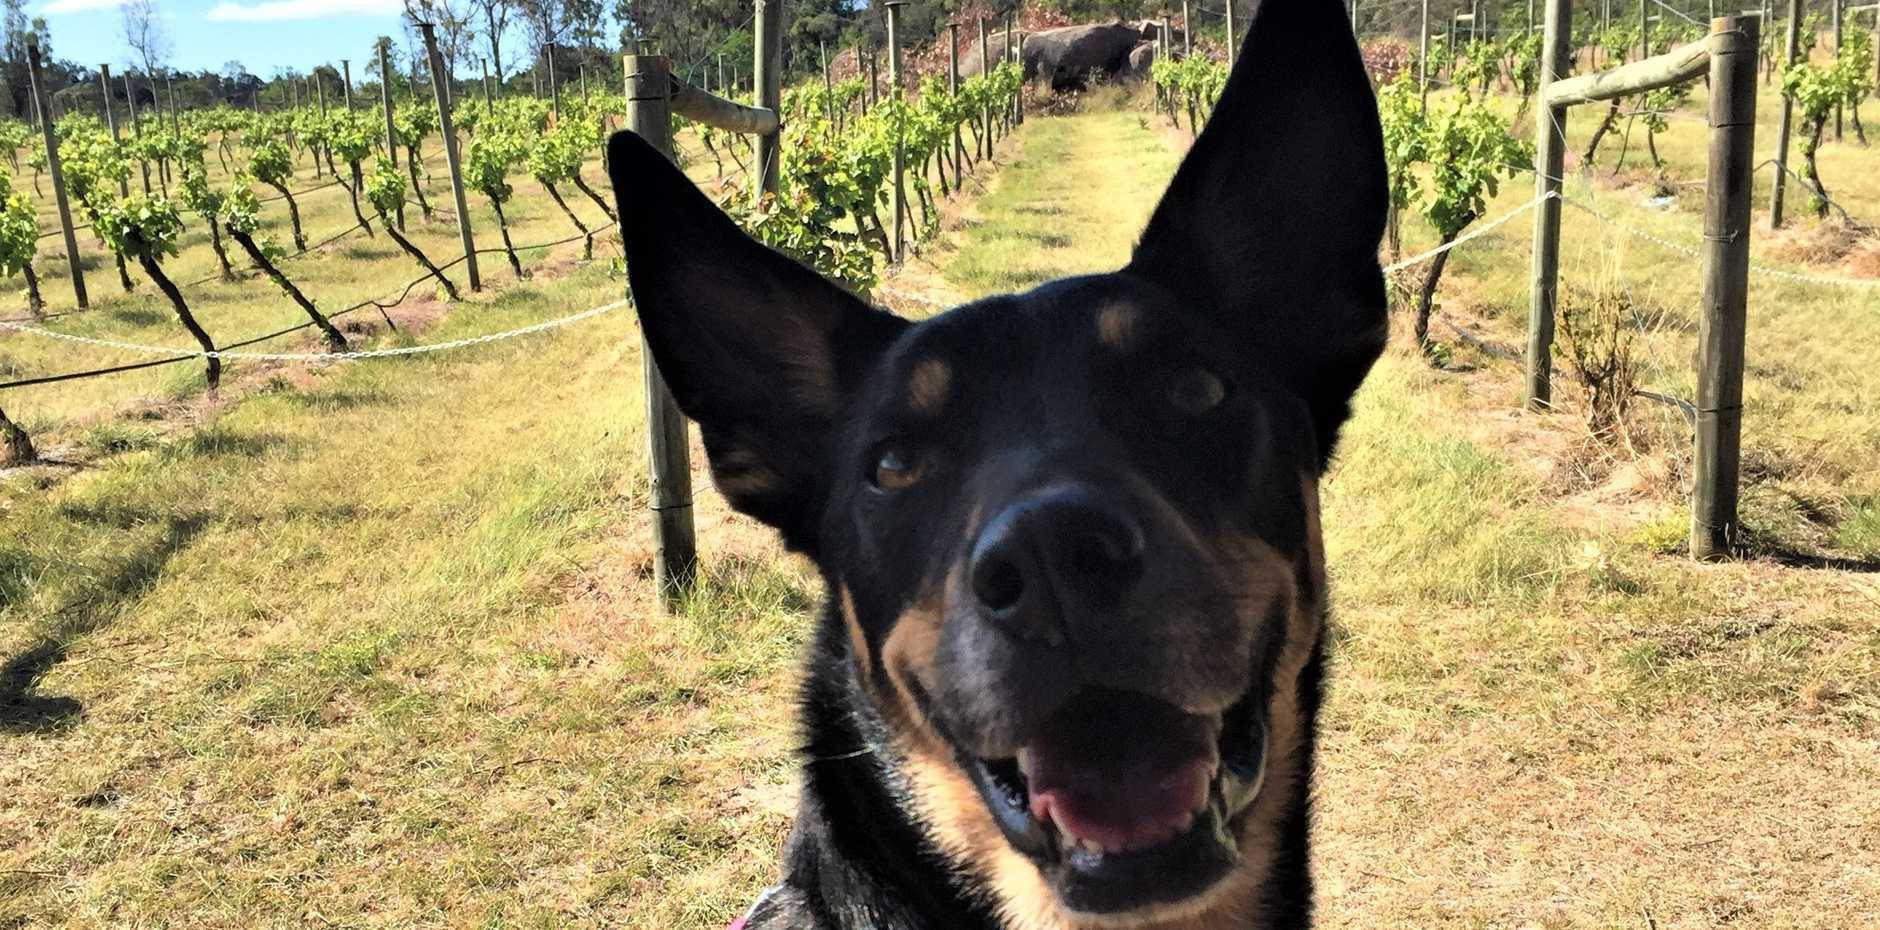 Pooch Piper enjoys her wine tour across the Granite Belt.CREDIT: Dan Denham